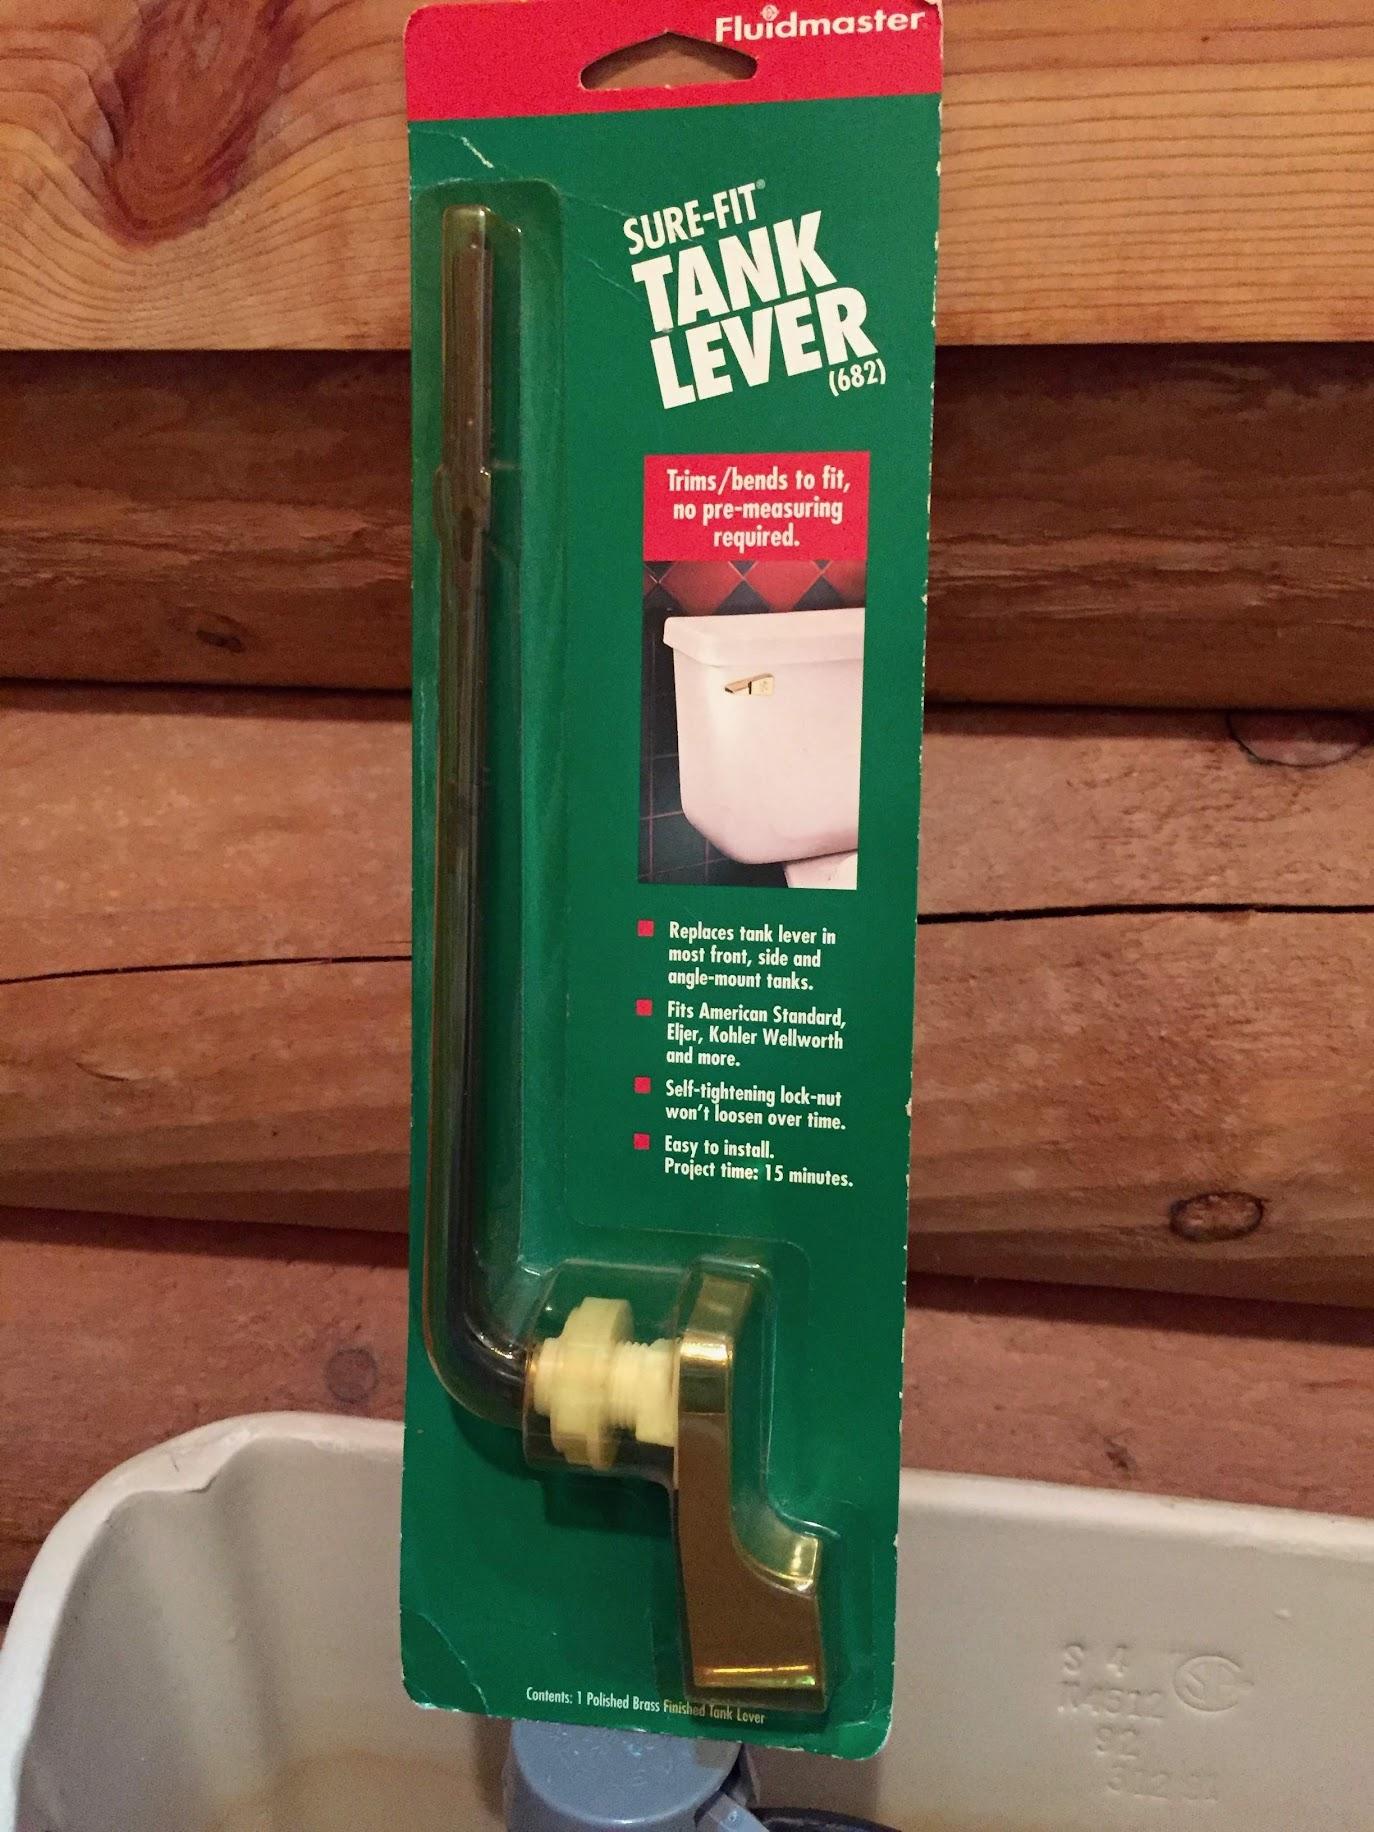 Repairing Toilet Tank with Fluidmaster Toilet Tank Complete Repair Kit (400AK)